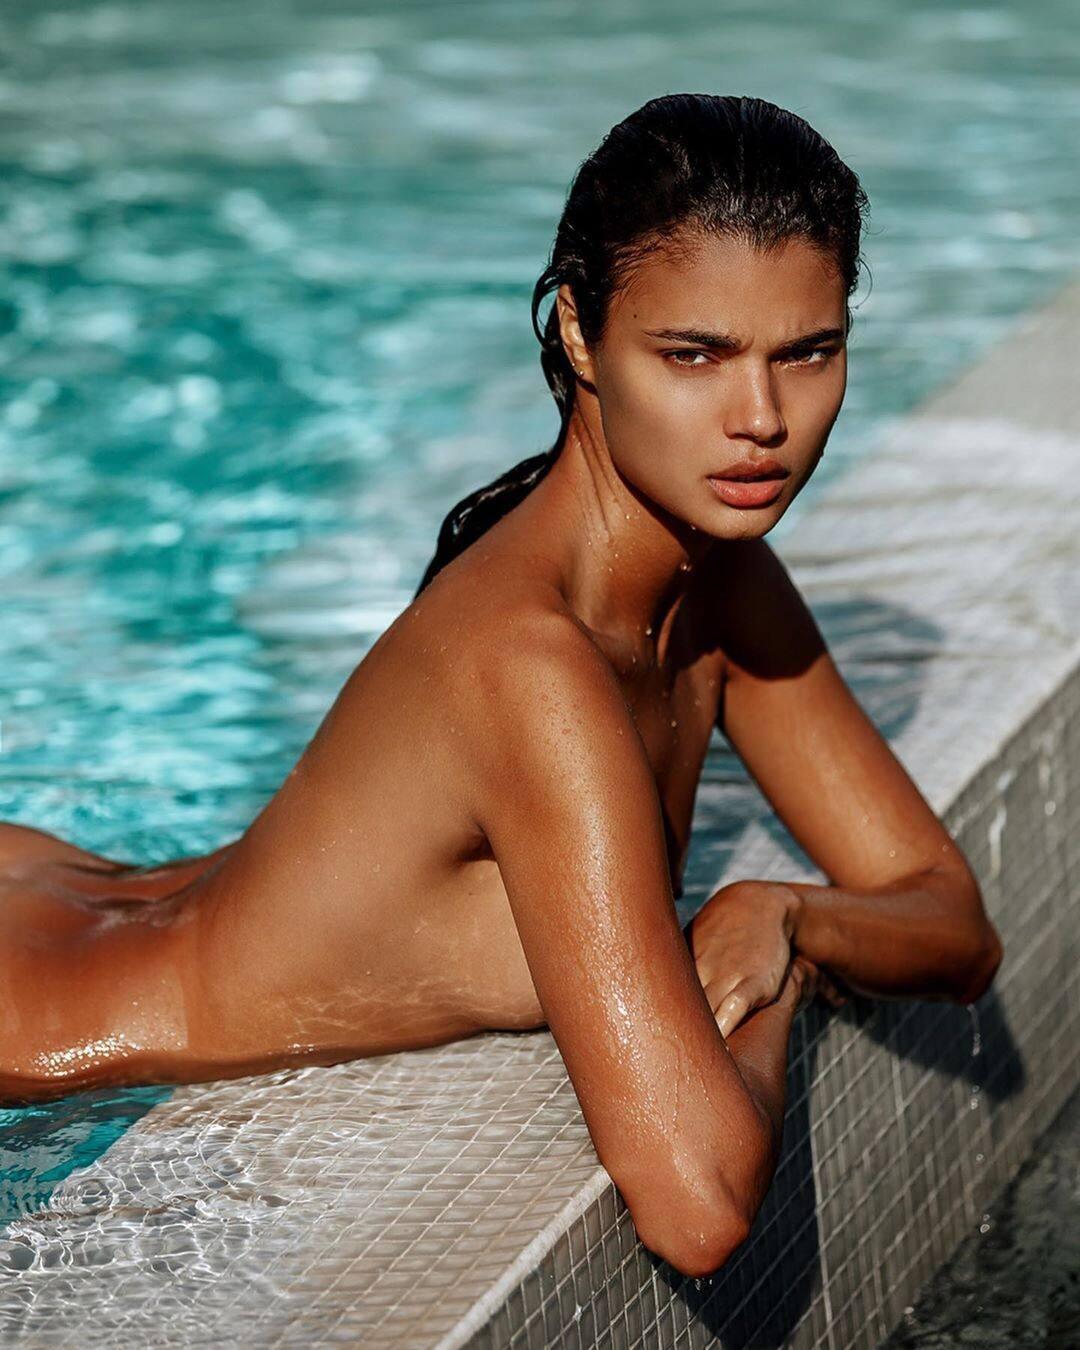 Daniela Braga – Hot Body In Sexy Instagram Pics 0001